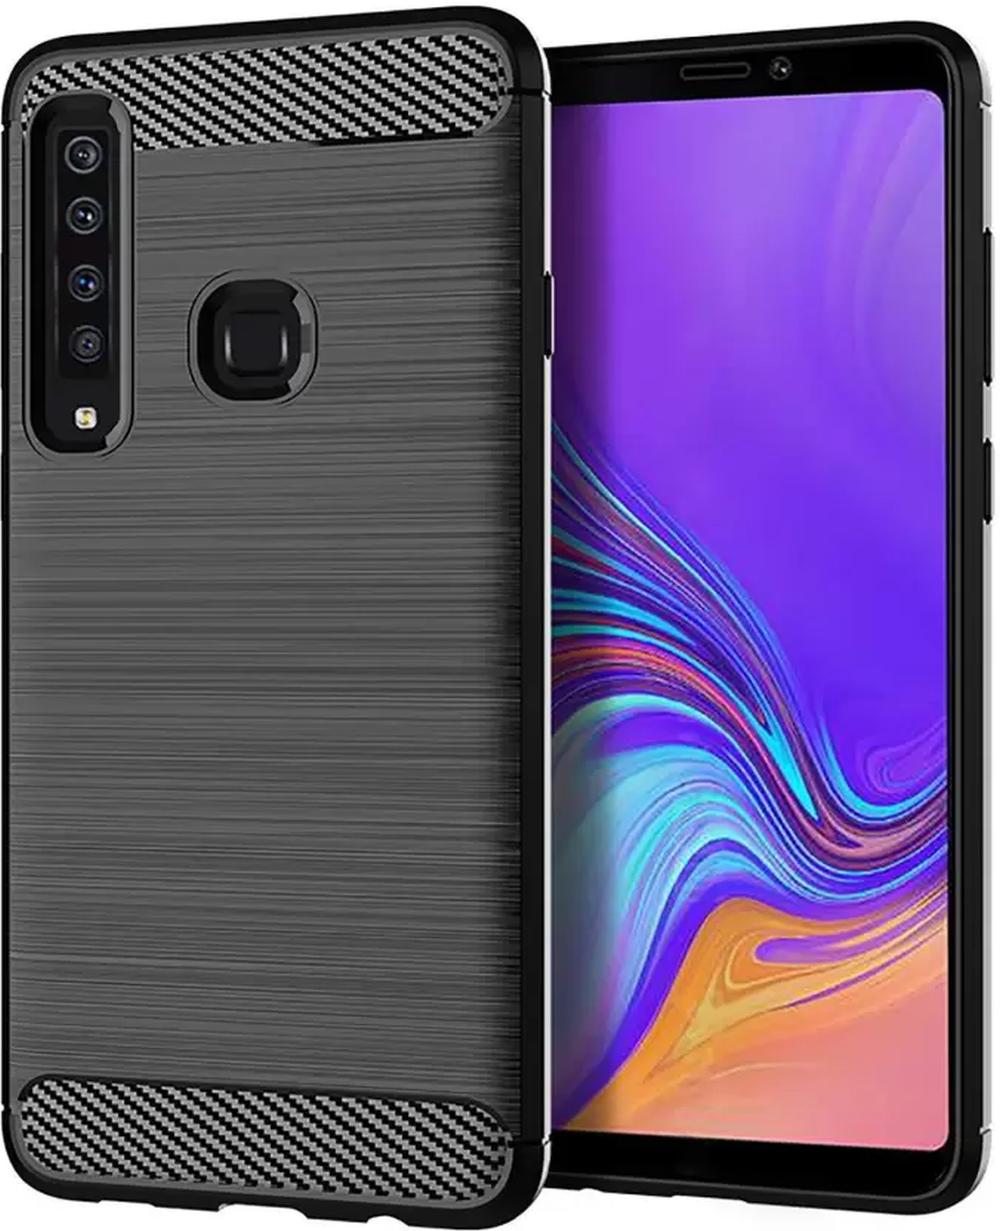 Samsung Galaxy A9 hard case